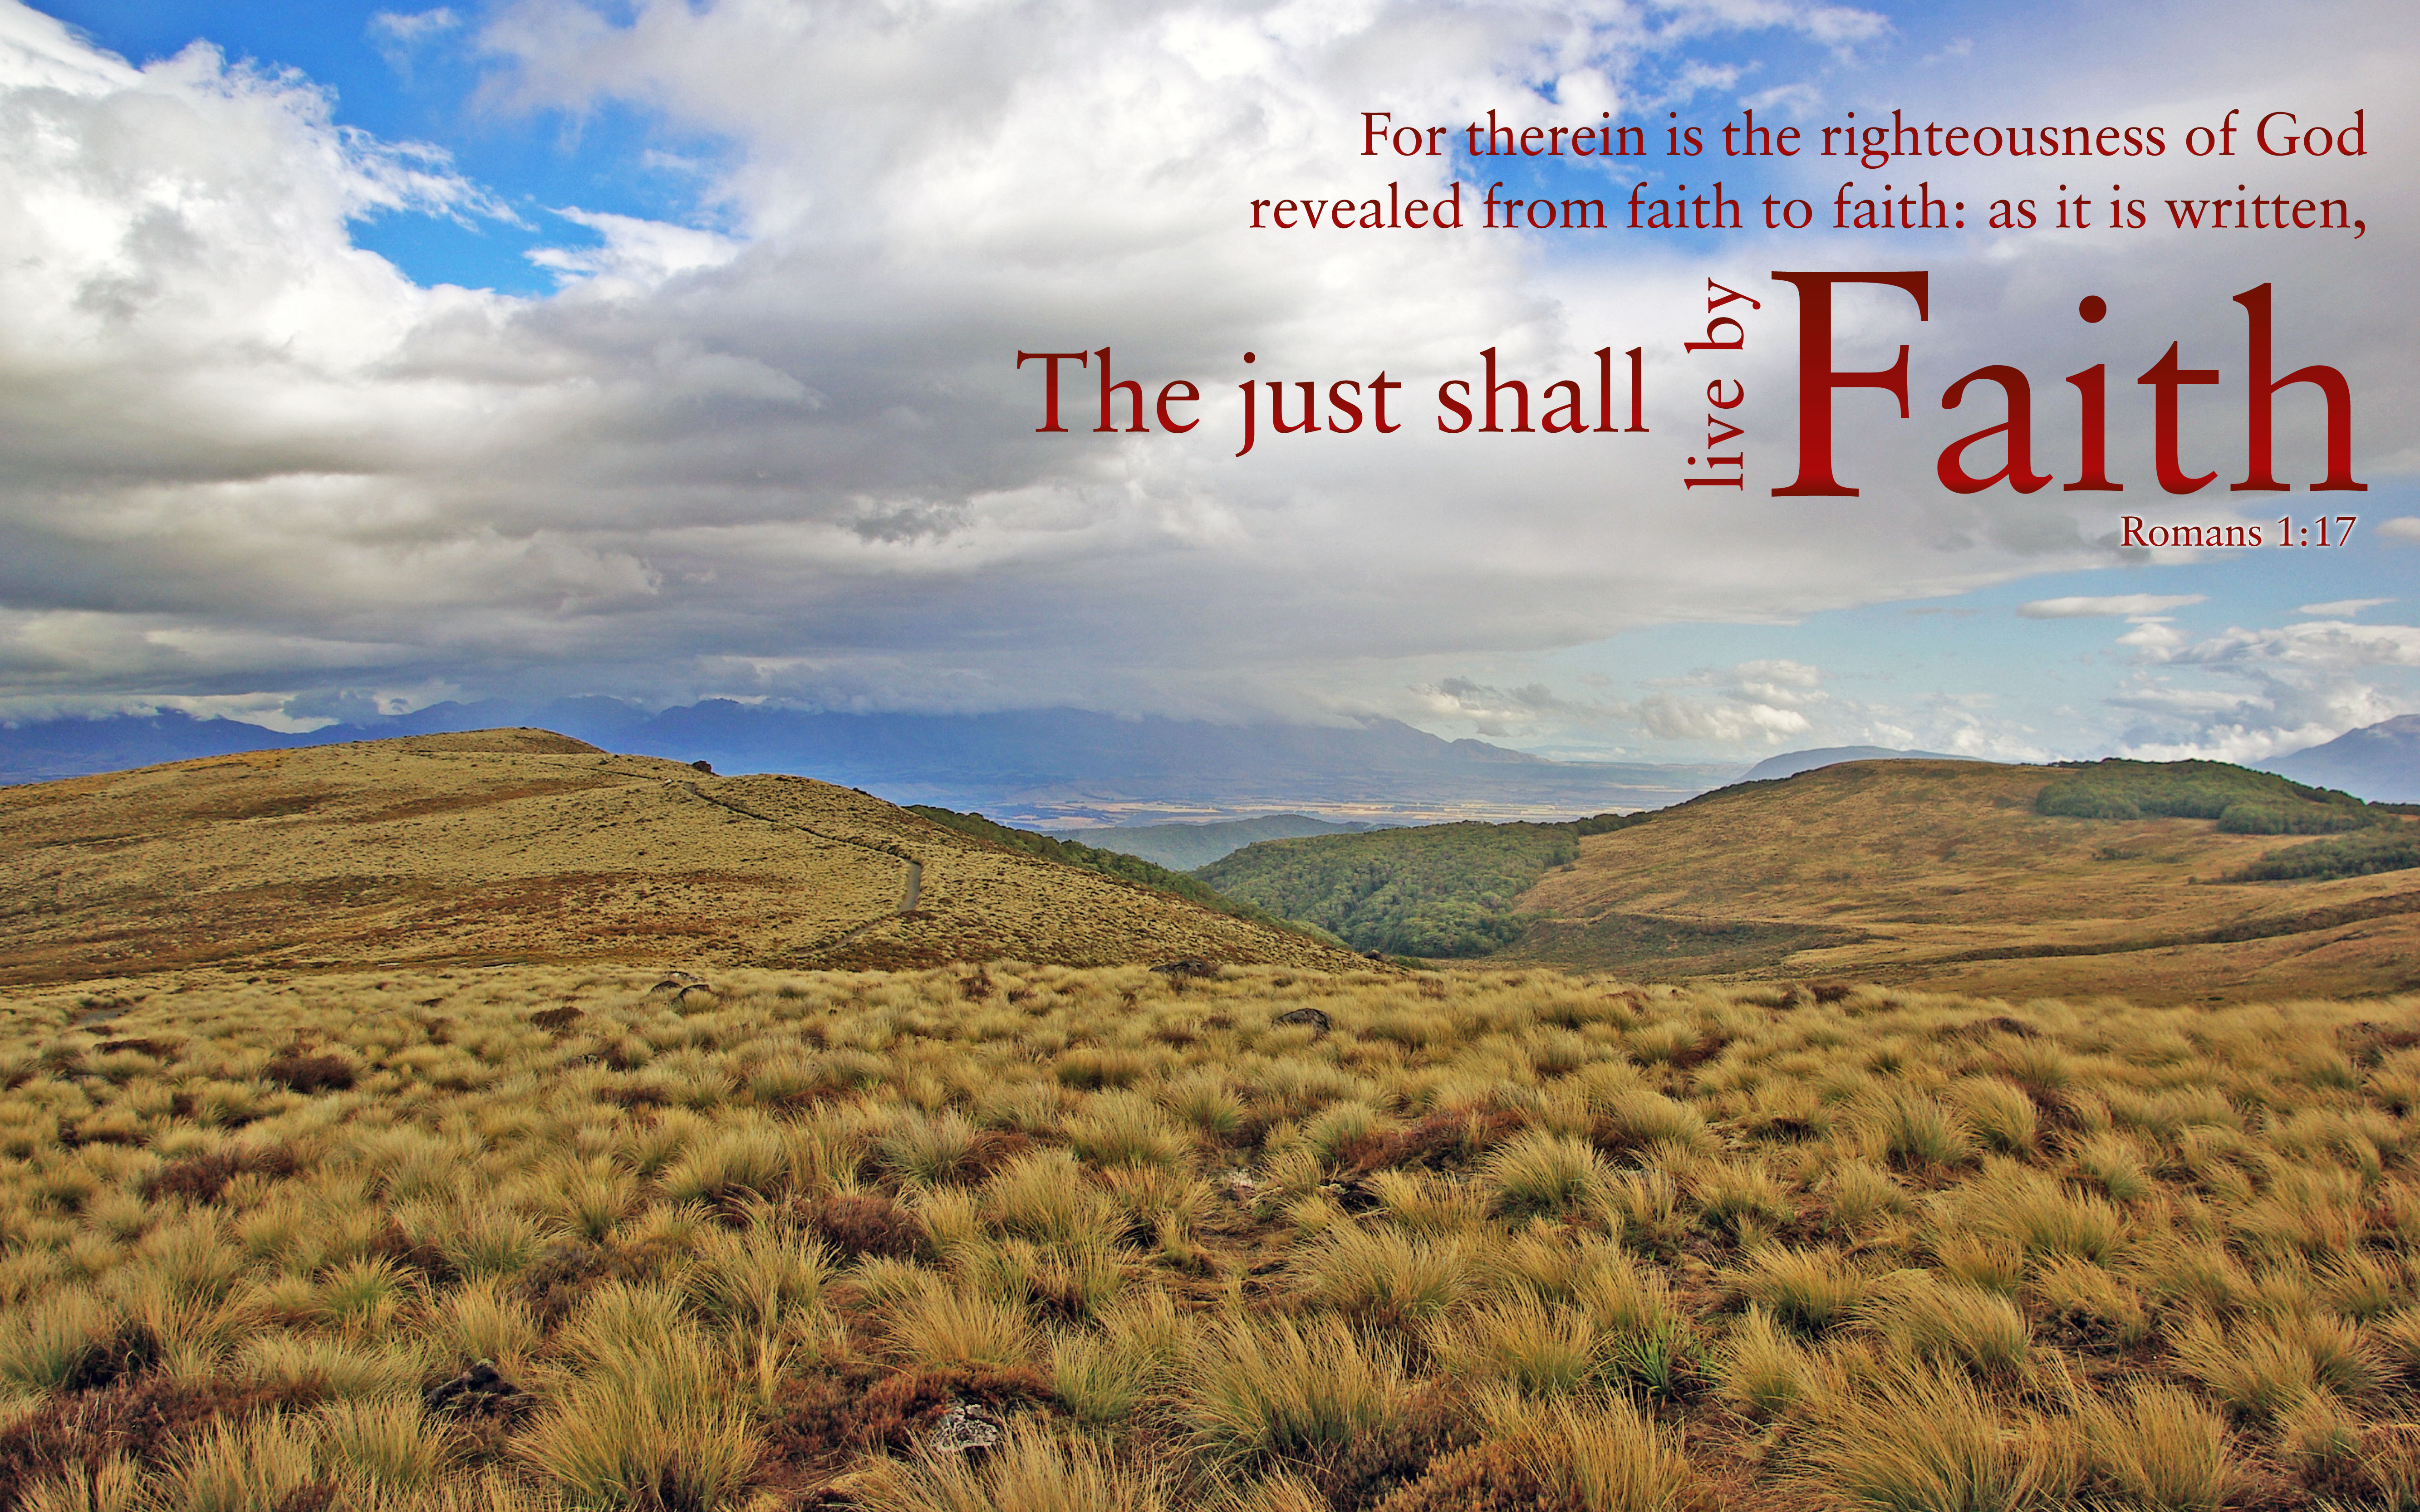 Romans 1:17 - Free Nature u0026 Bible Desktop Background / Wallpaper